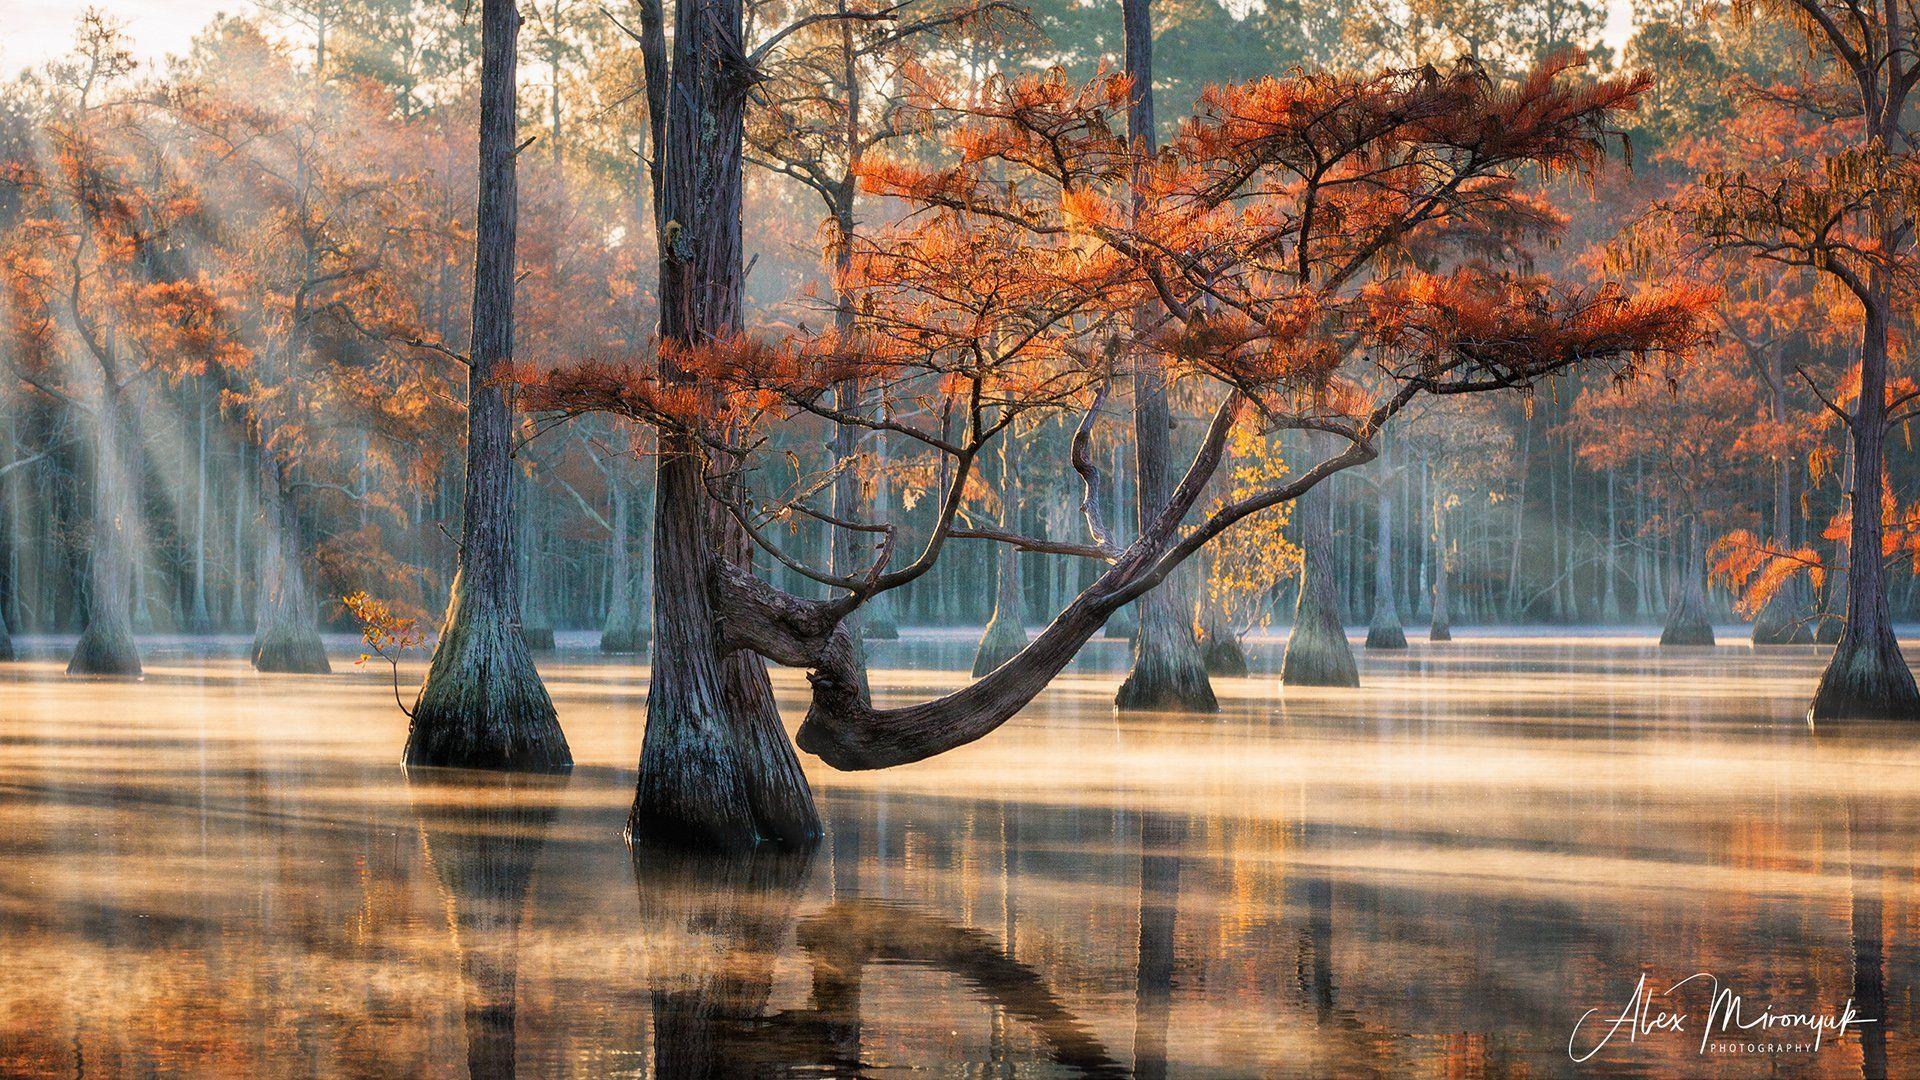 болото, кипарис, озеро, утро, солнце, рассвет, лес, отражение, вода, Alex Mironyuk